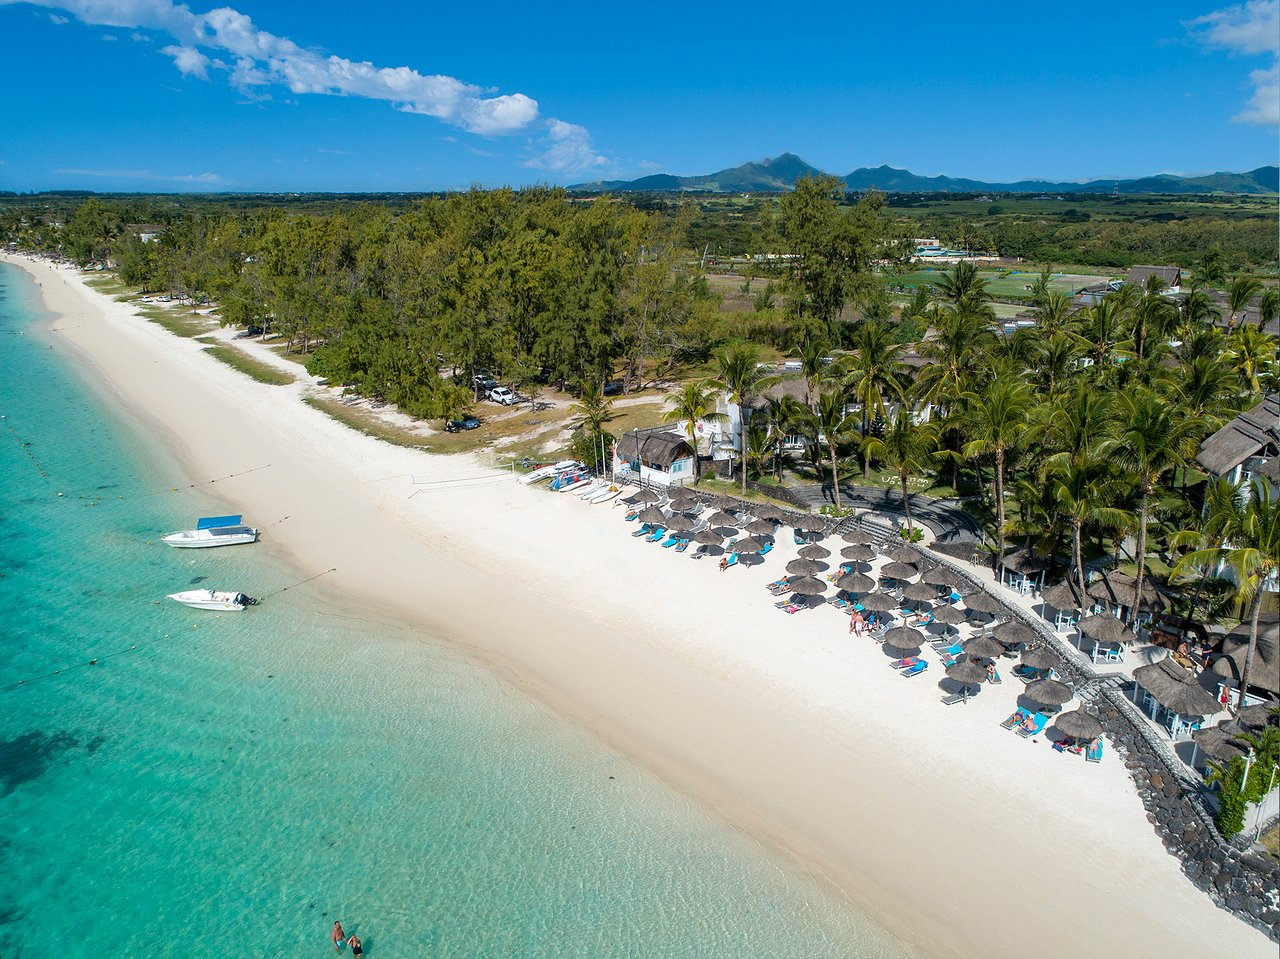 Veranda Palmar Beach Updated 2018 Prices Resort Reviews Mauritius Belle Mare Tripadvisor